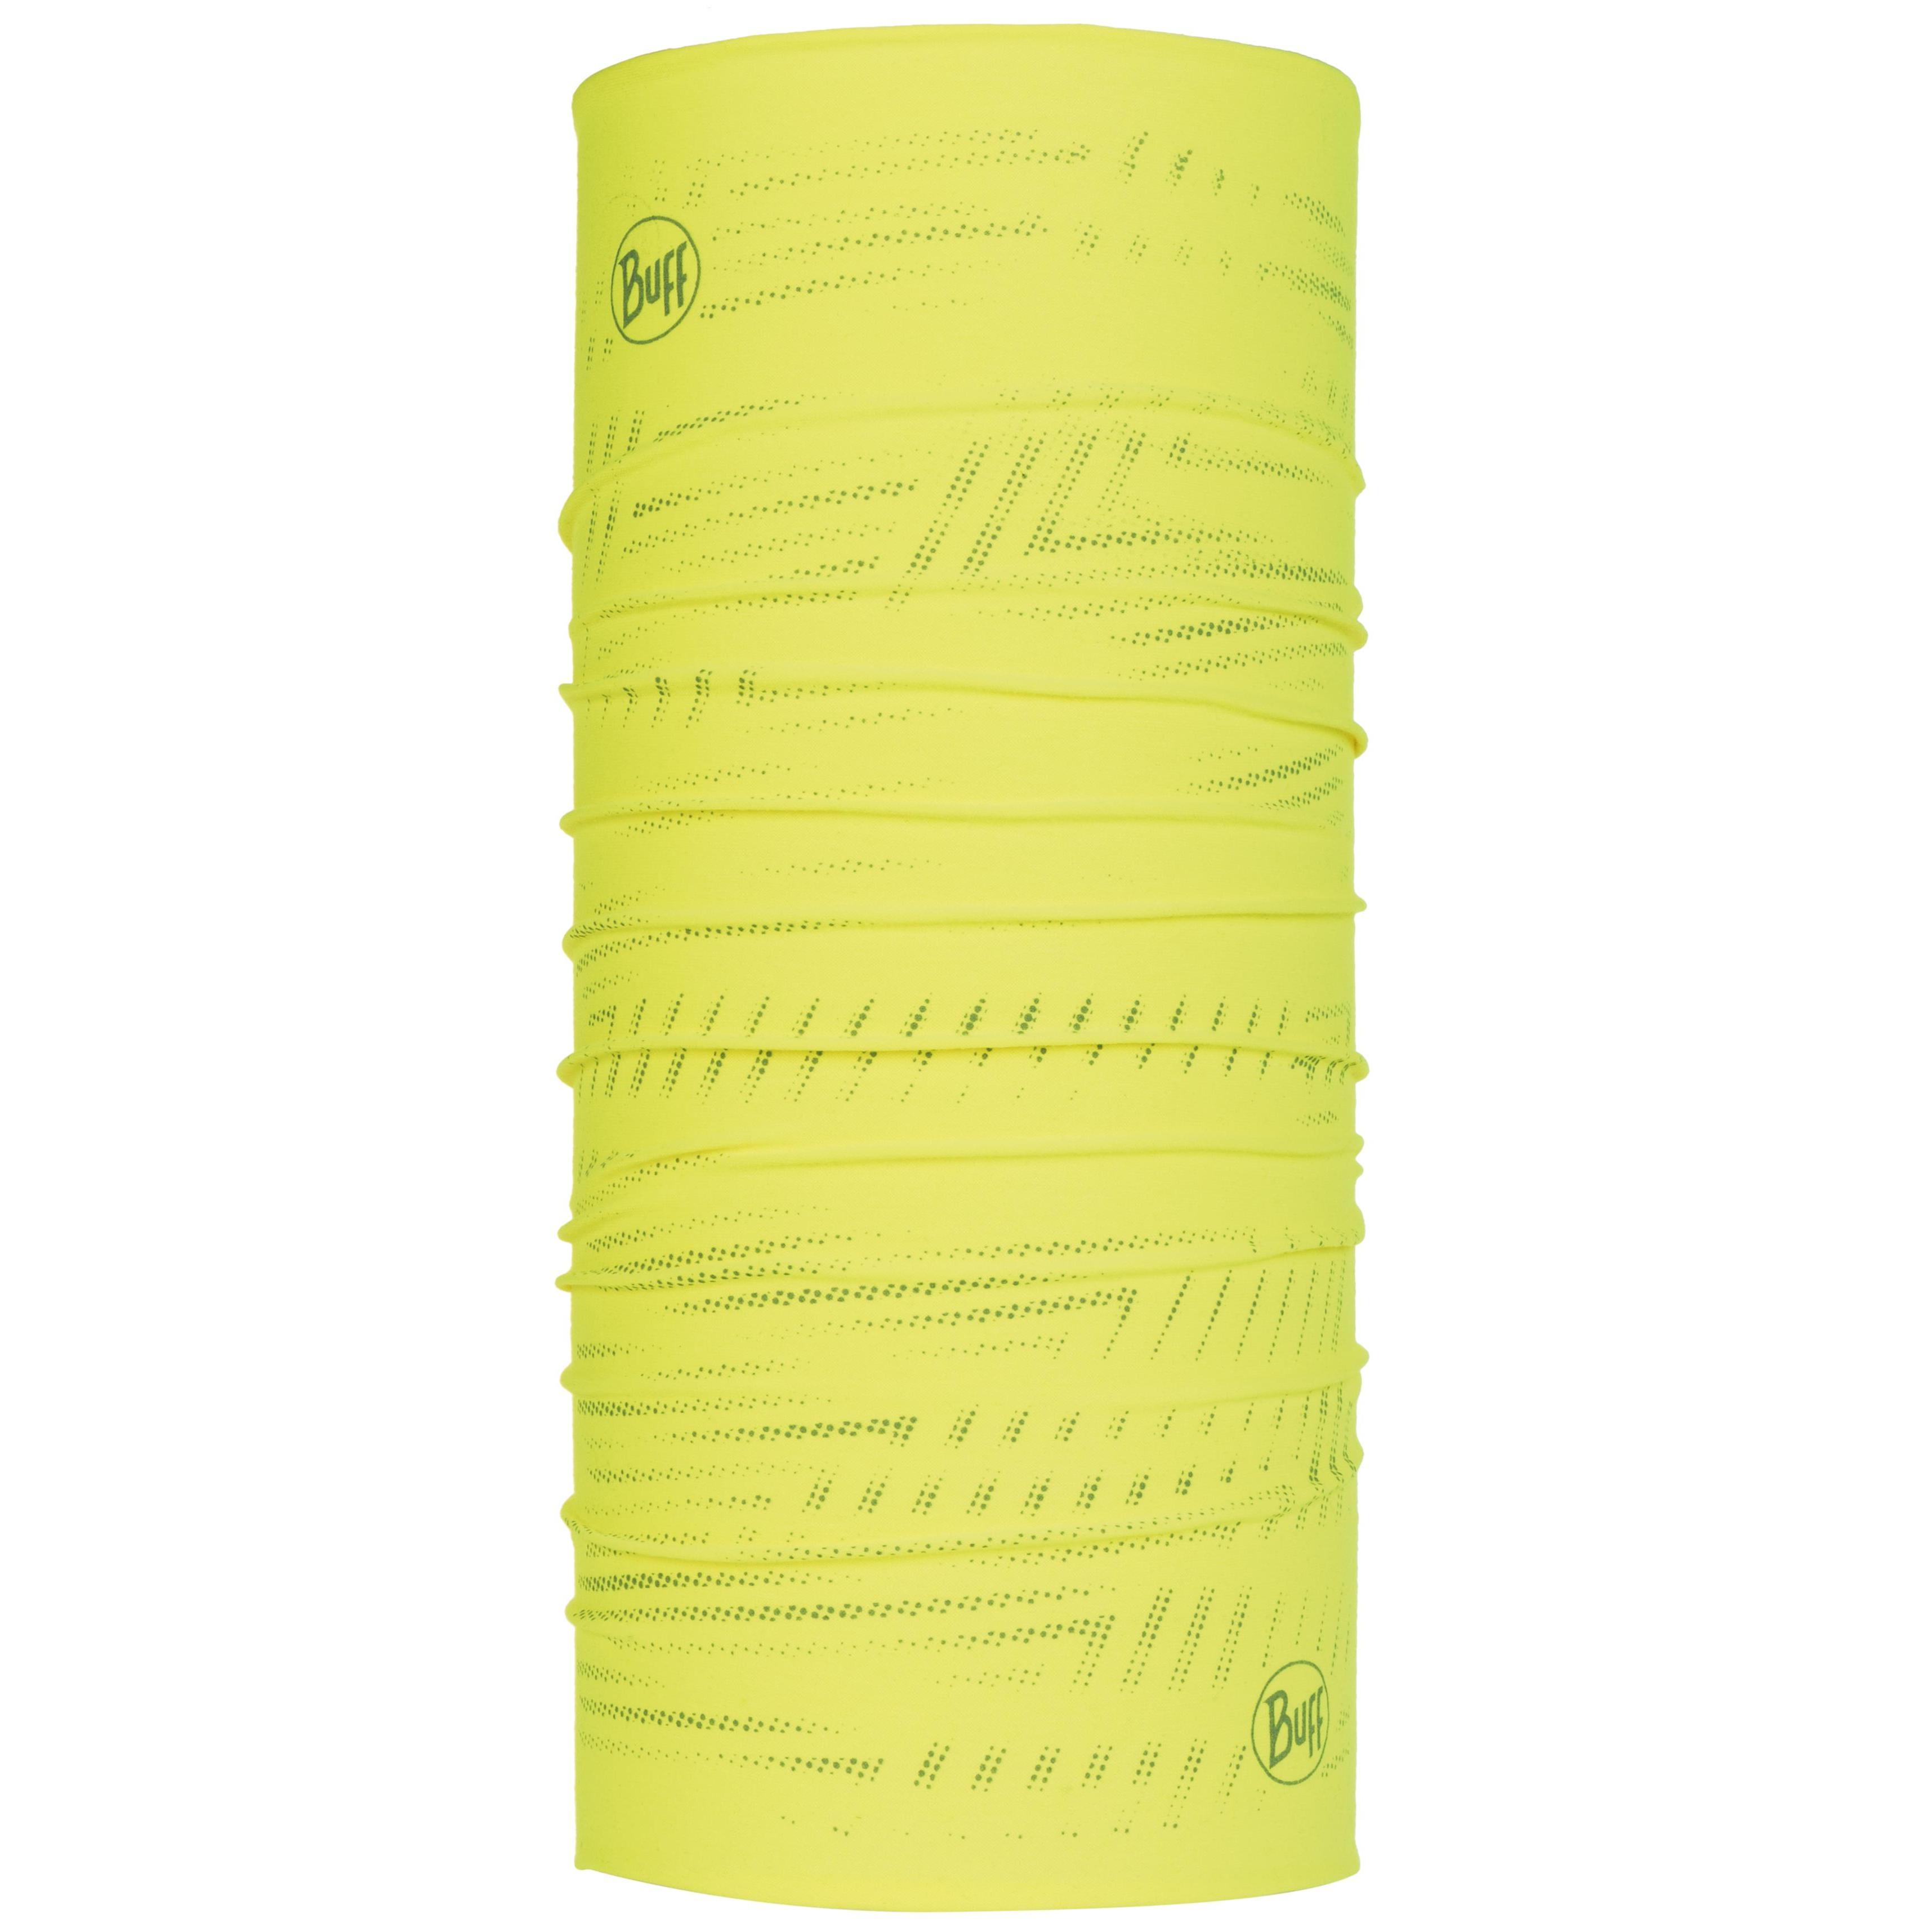 Бандана Buff Coolnet UV+ Reflective желтая One Size